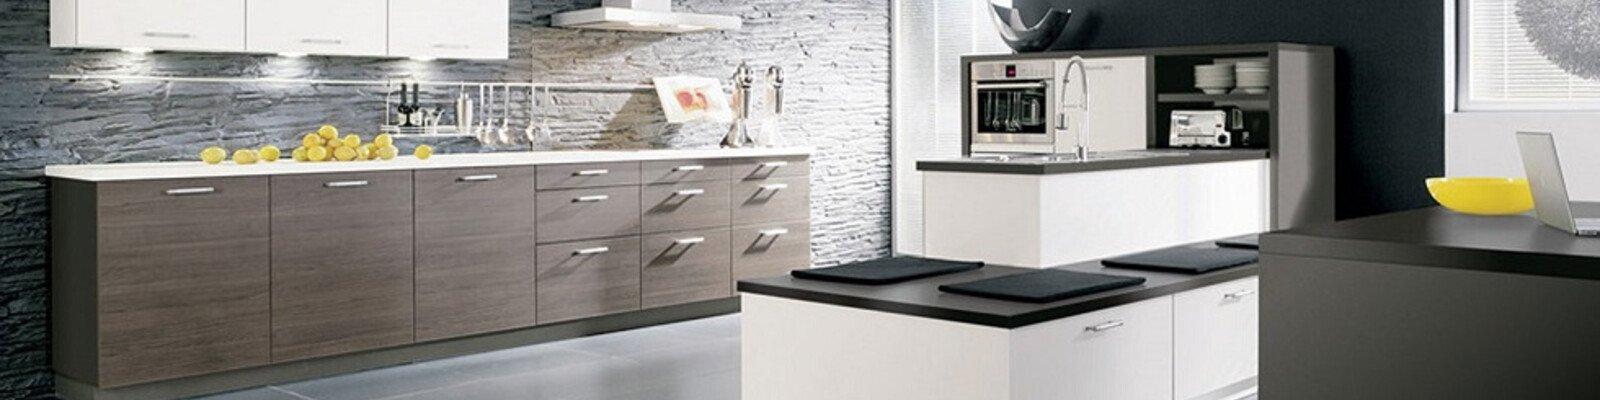 Keukentegels: design muurtegels, Spaanse & Italiaanse tegels